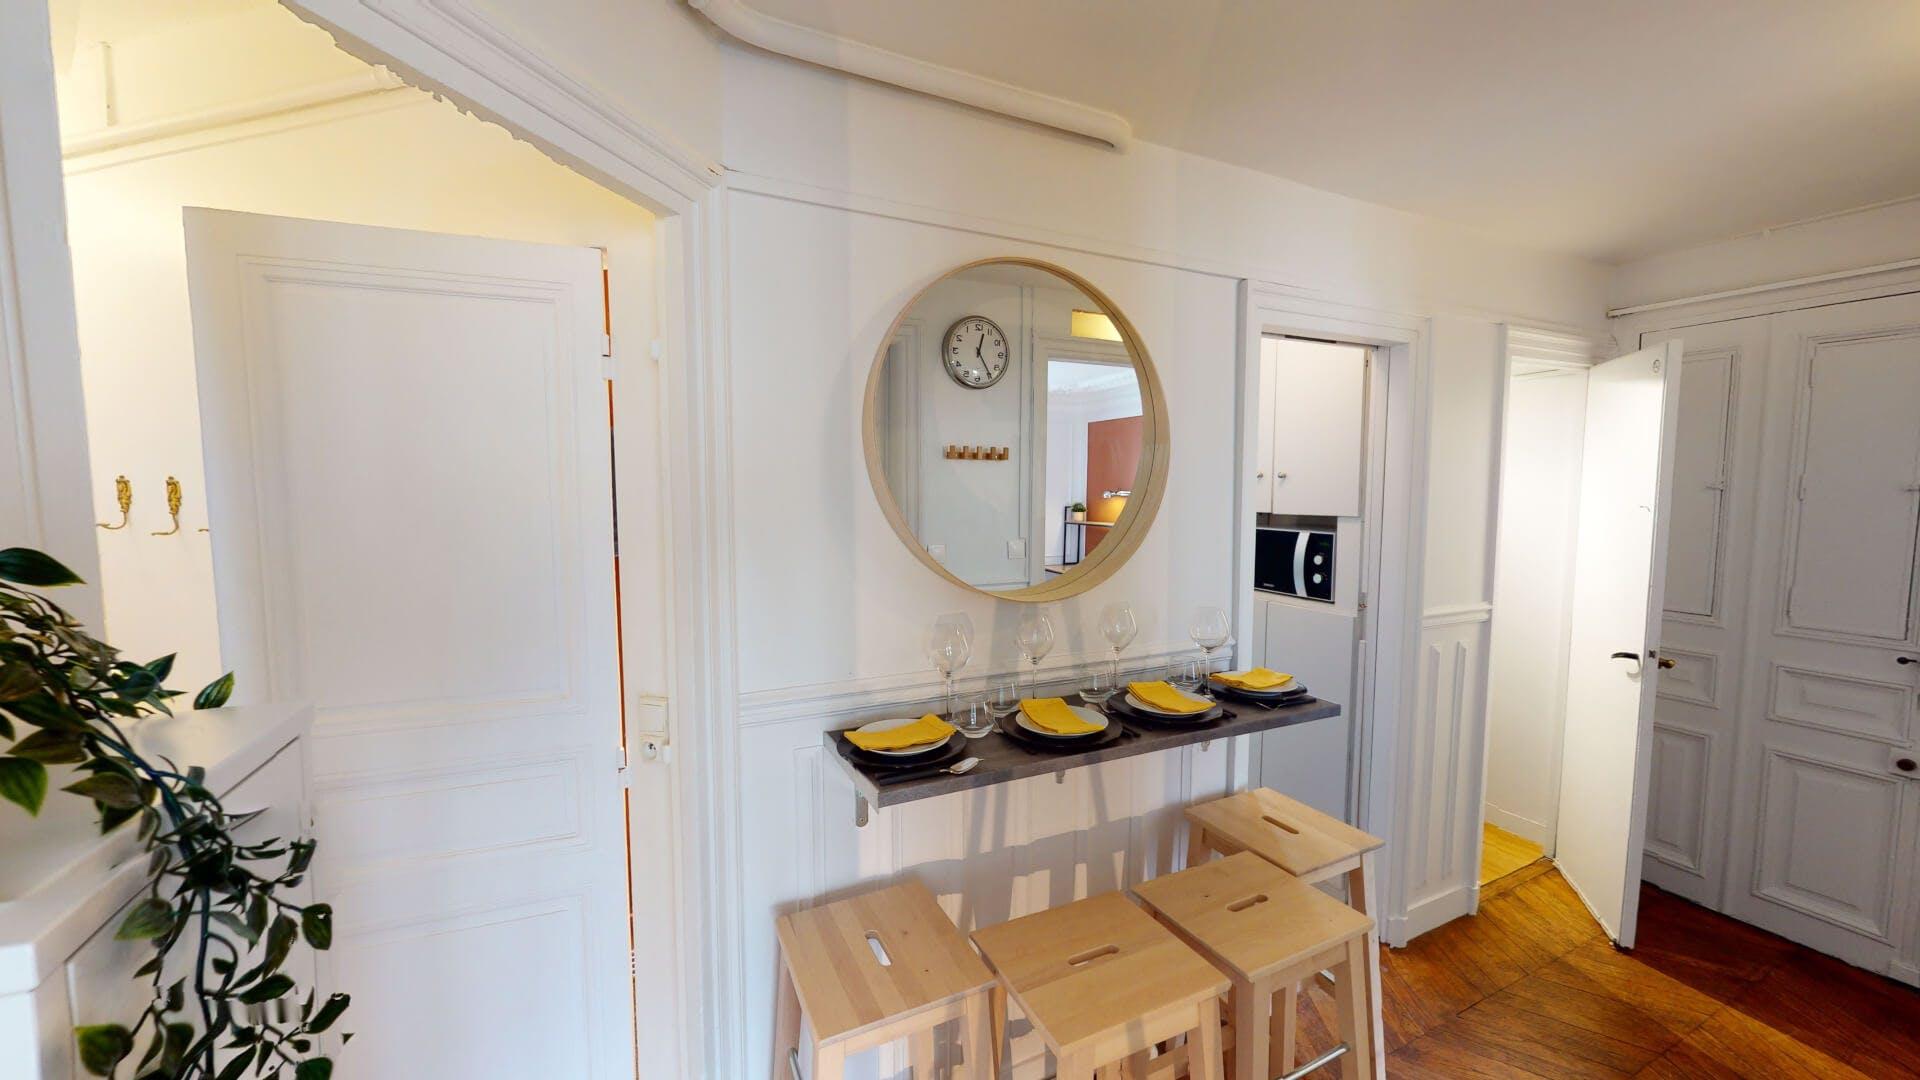 4 Residents   Champ-de-Mars   Marvelous & Modern Apt - Incl. Workspace